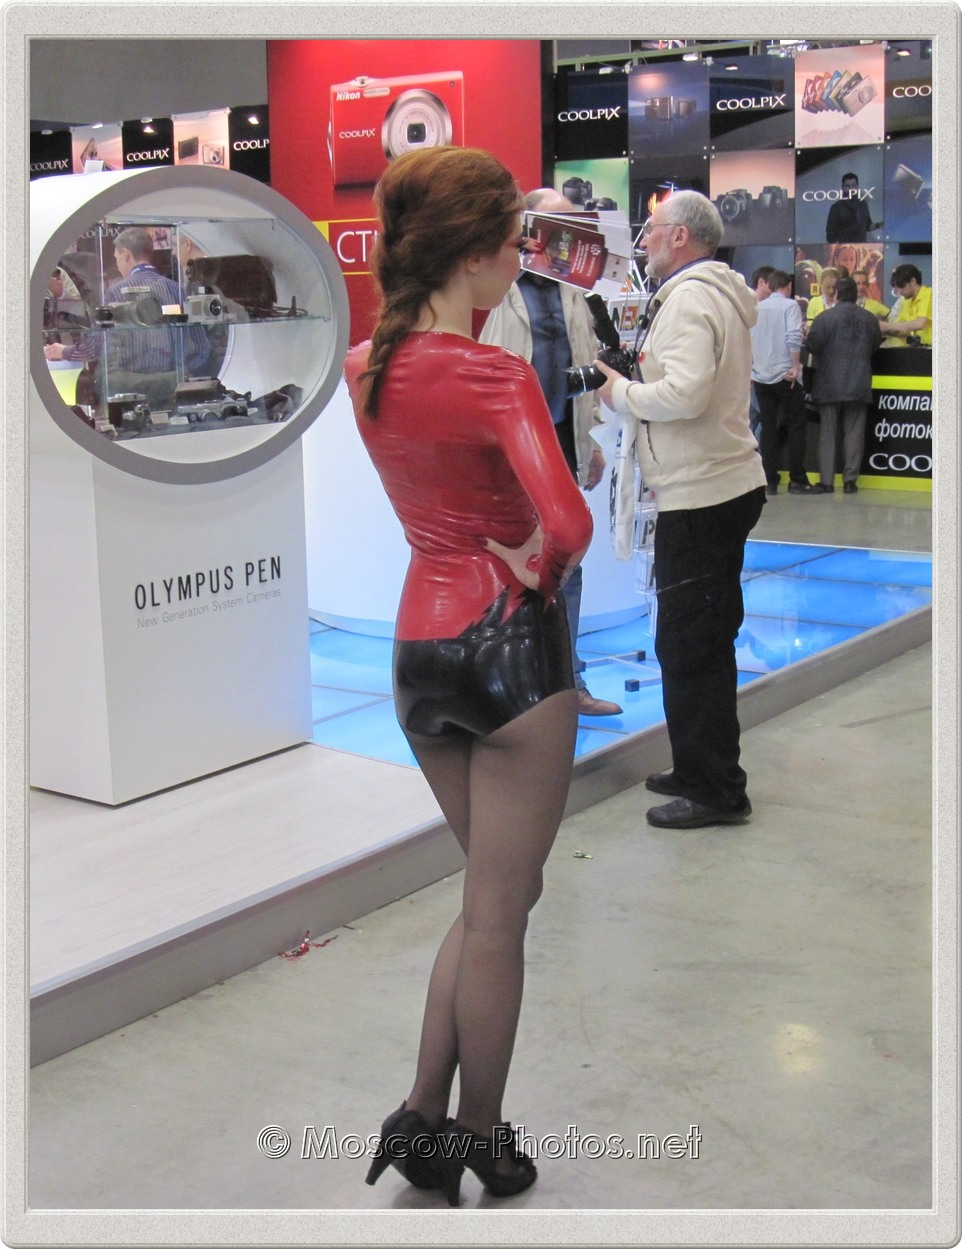 Promo Model at Photoforum - 2010